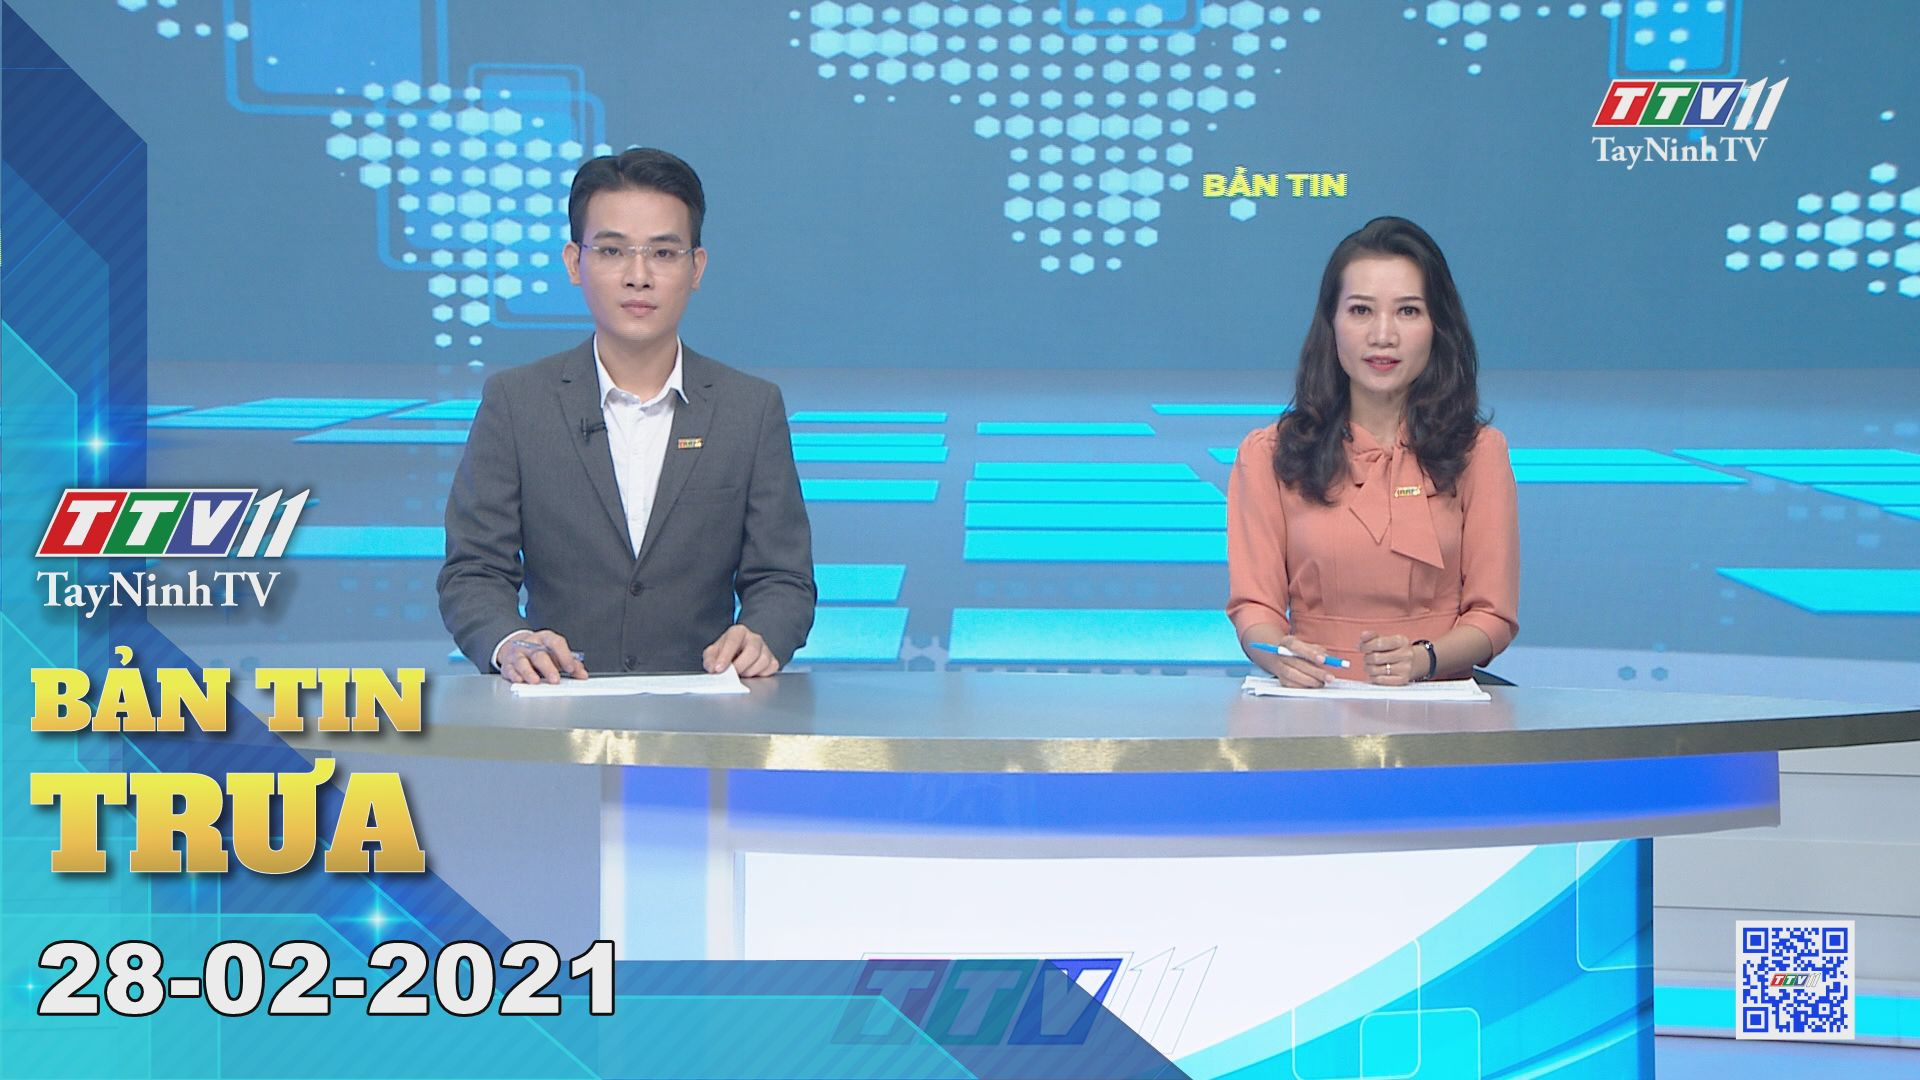 Bản tin trưa 28-02-2021 | Tin tức hôm nay | TayNinhTV